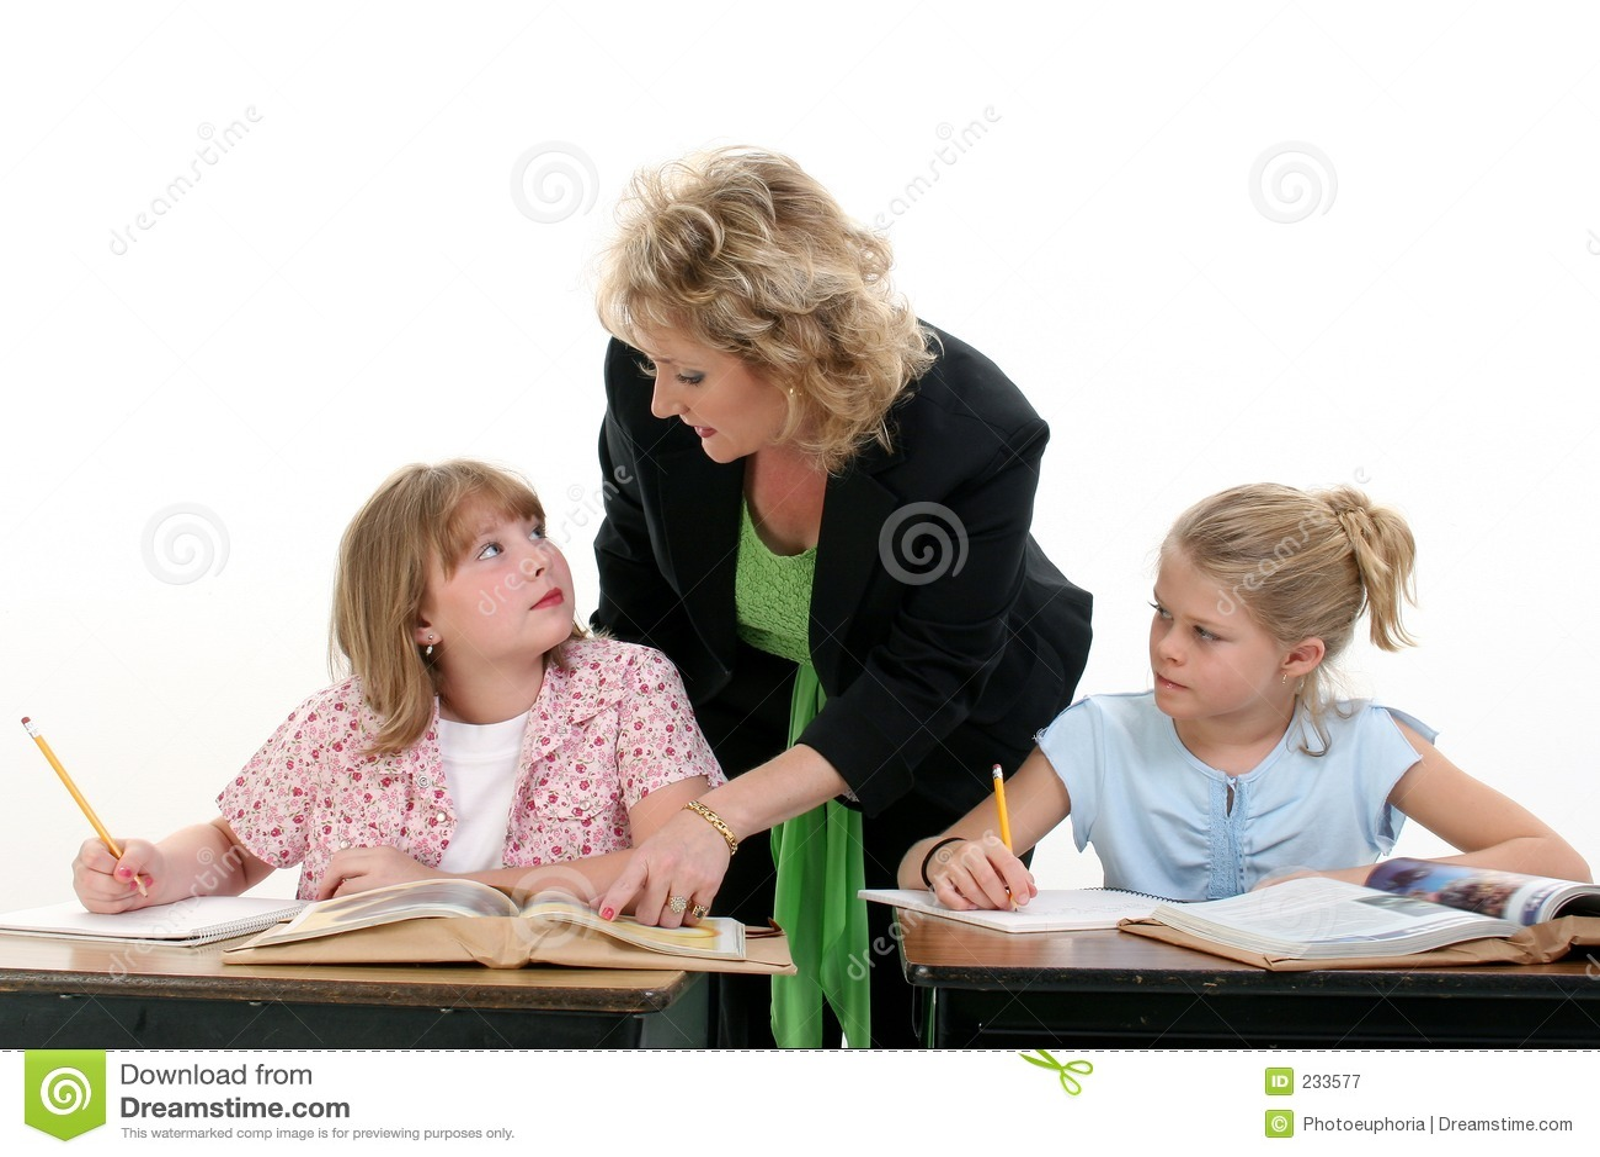 Teacher Helping Child in Classroom